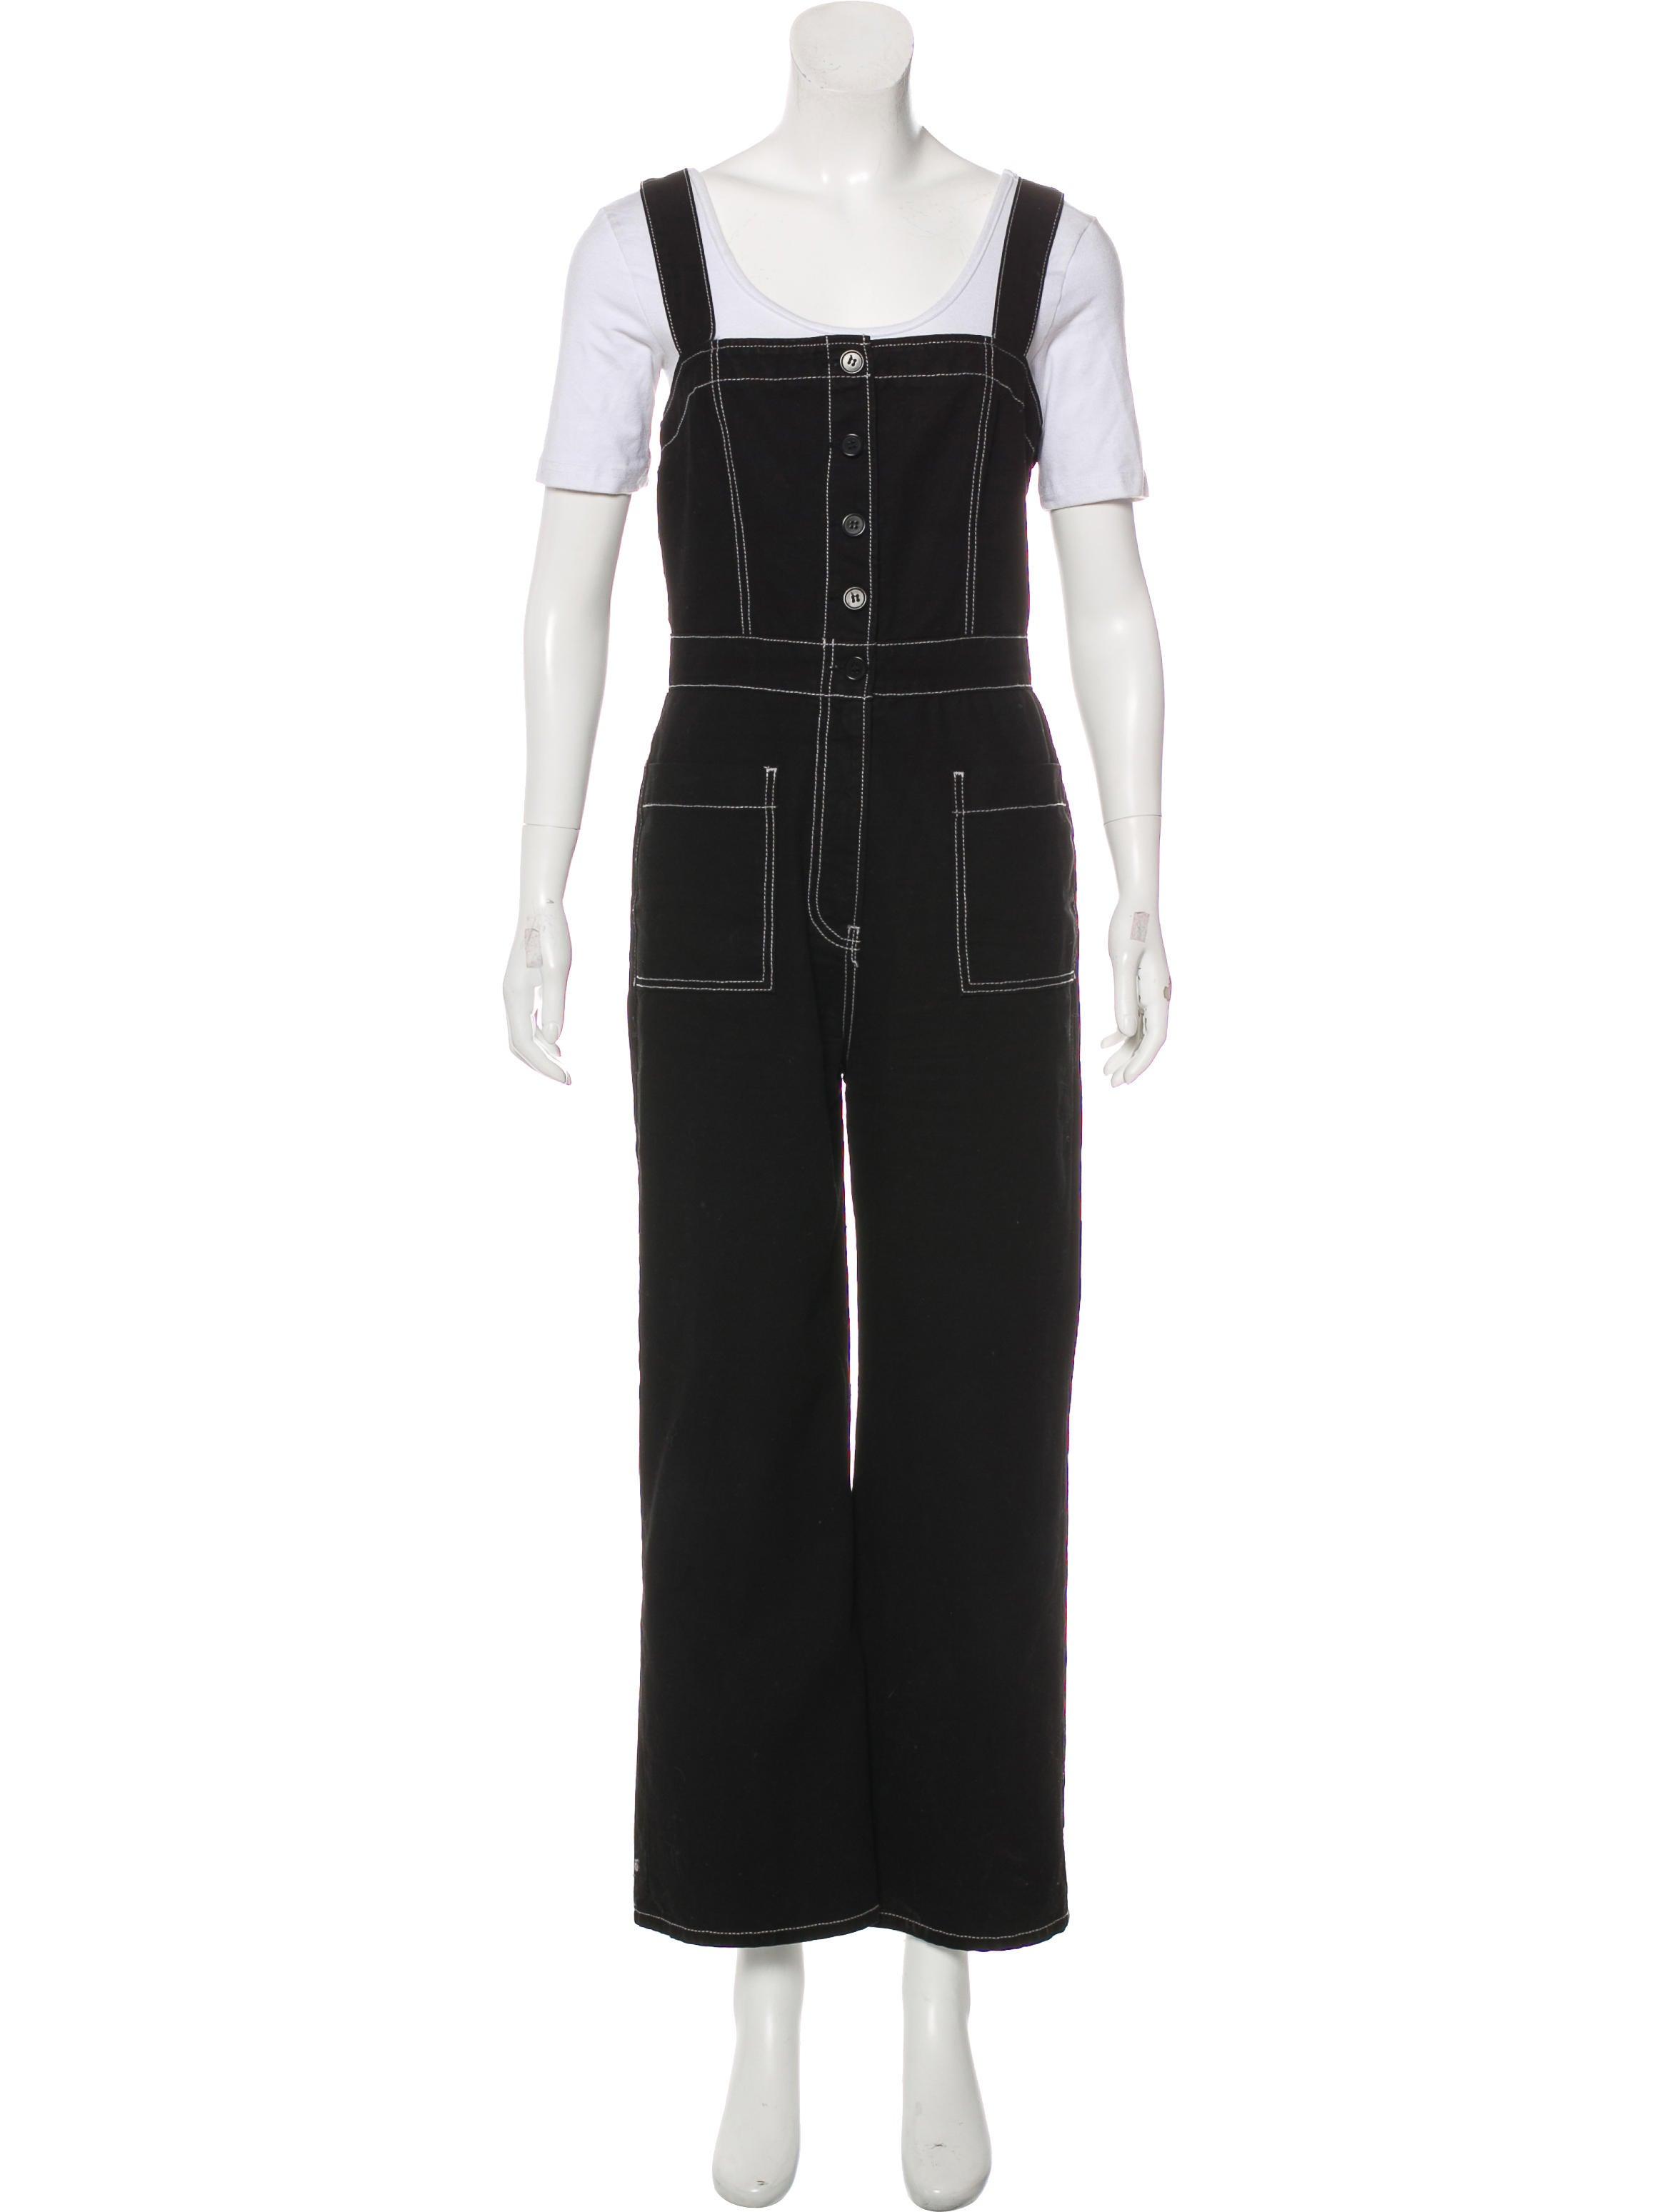 2e567ec7fa2 Reformation Amory Wide-Leg Jumpsuit - Clothing - WRFMN26979